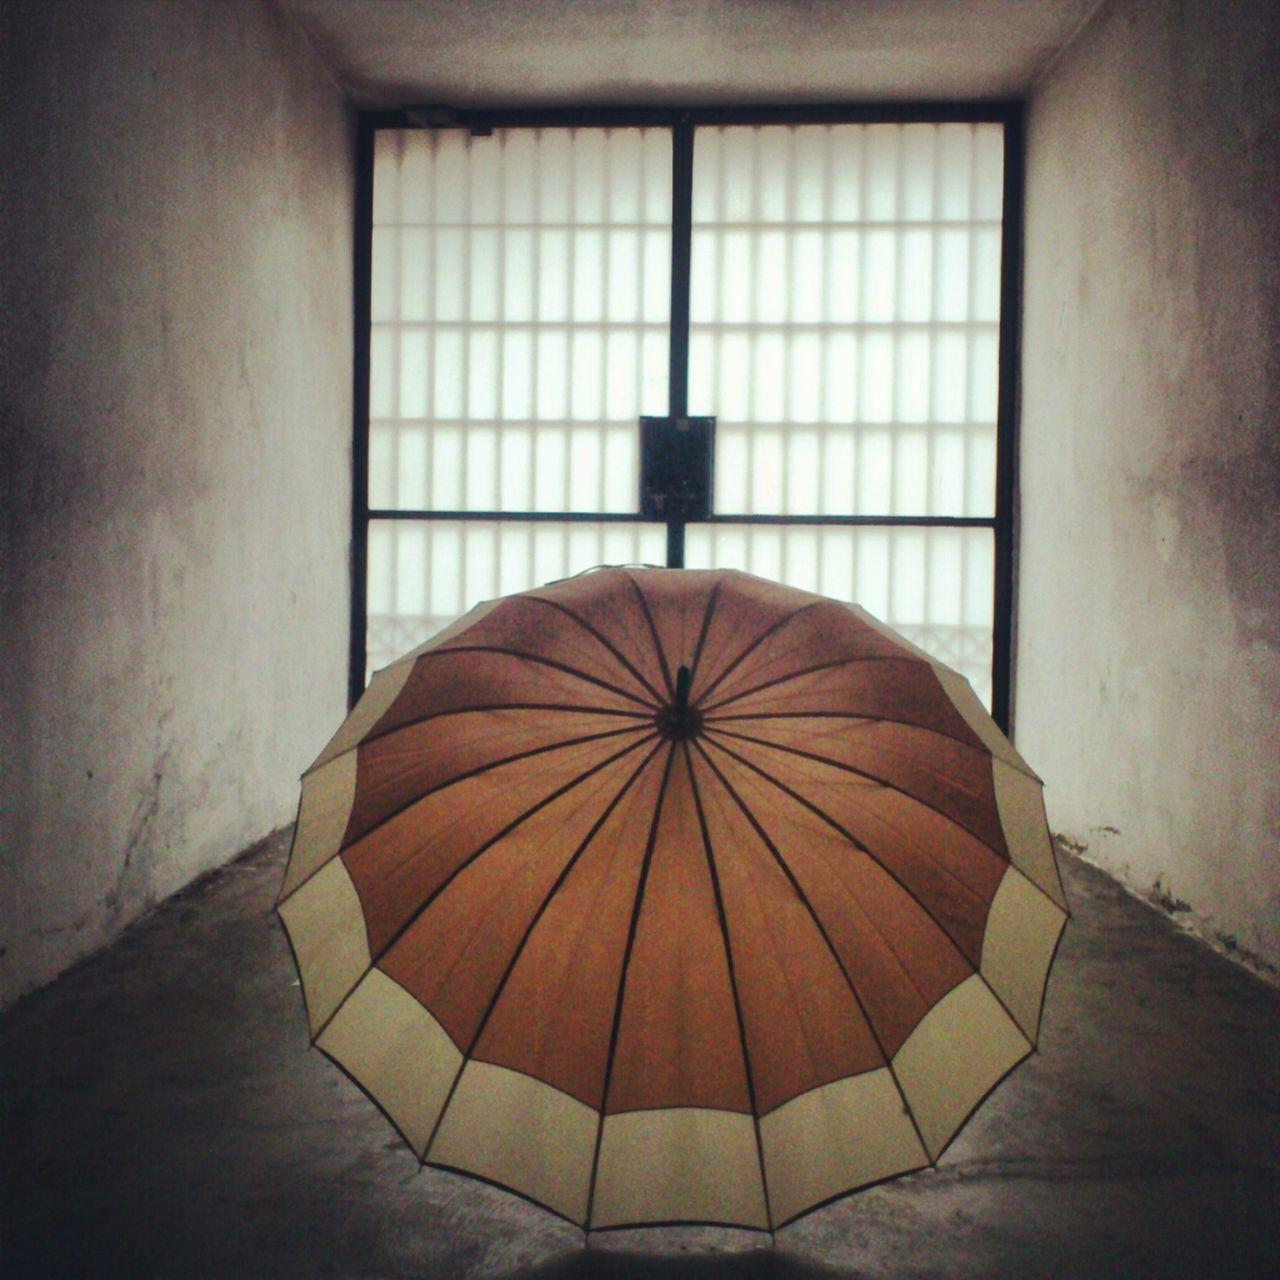 Light Taking Photos Umbrella The Minimals (less Edit Juxt Photography) Youmobile